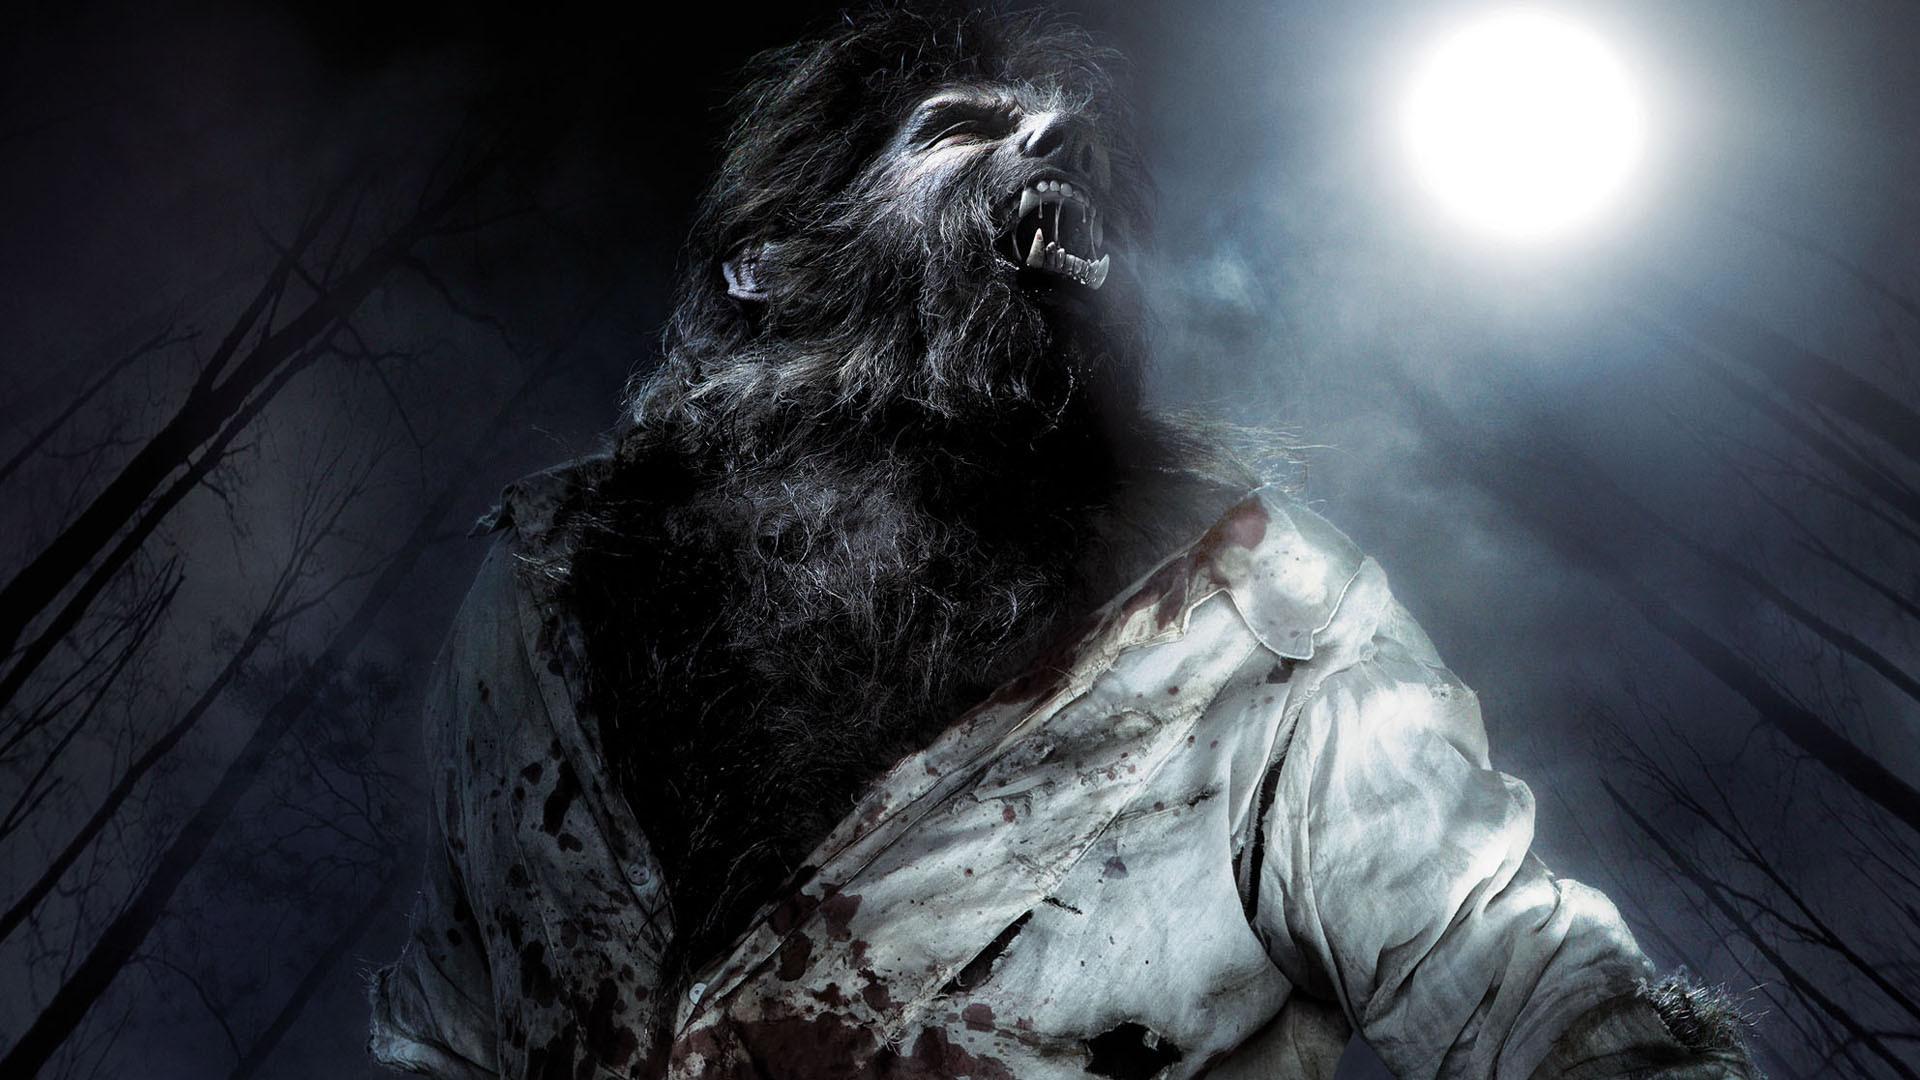 Drawn wolfman strong The image fanart Wolfman fanart